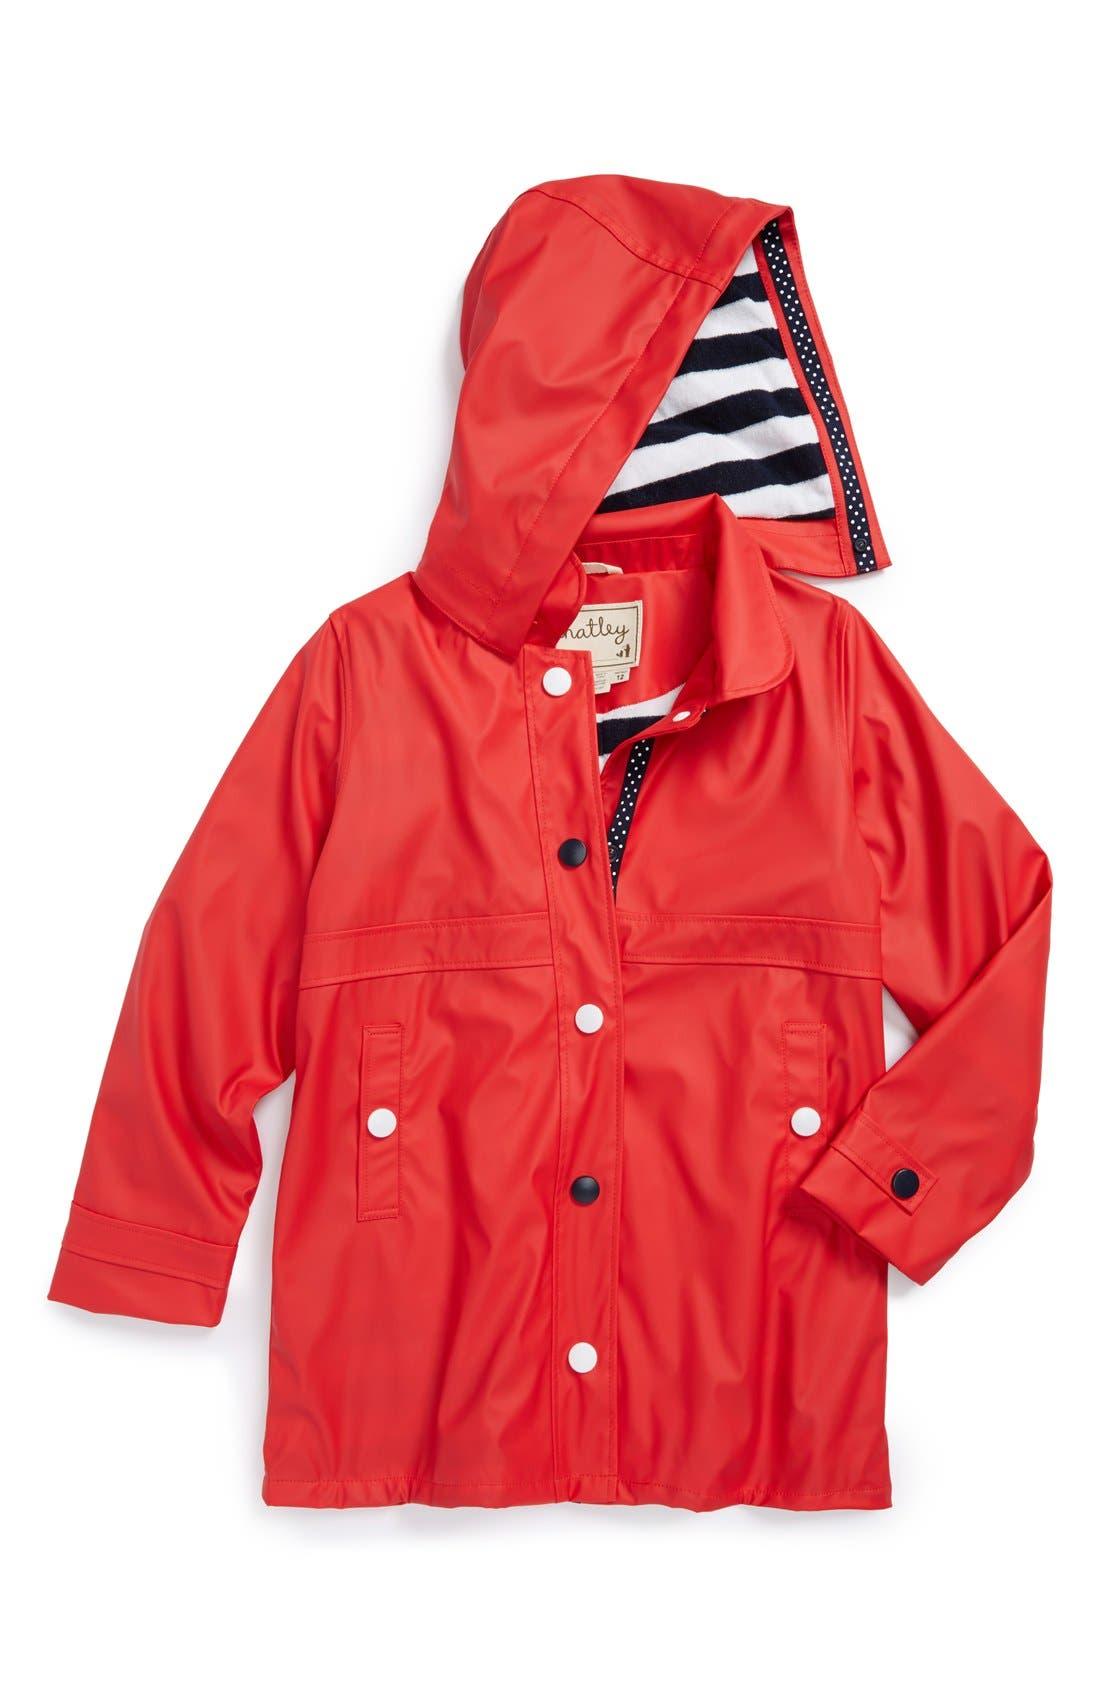 'Splash' Terry Lined Waterproof Rain Jacket,                             Main thumbnail 1, color,                             Red